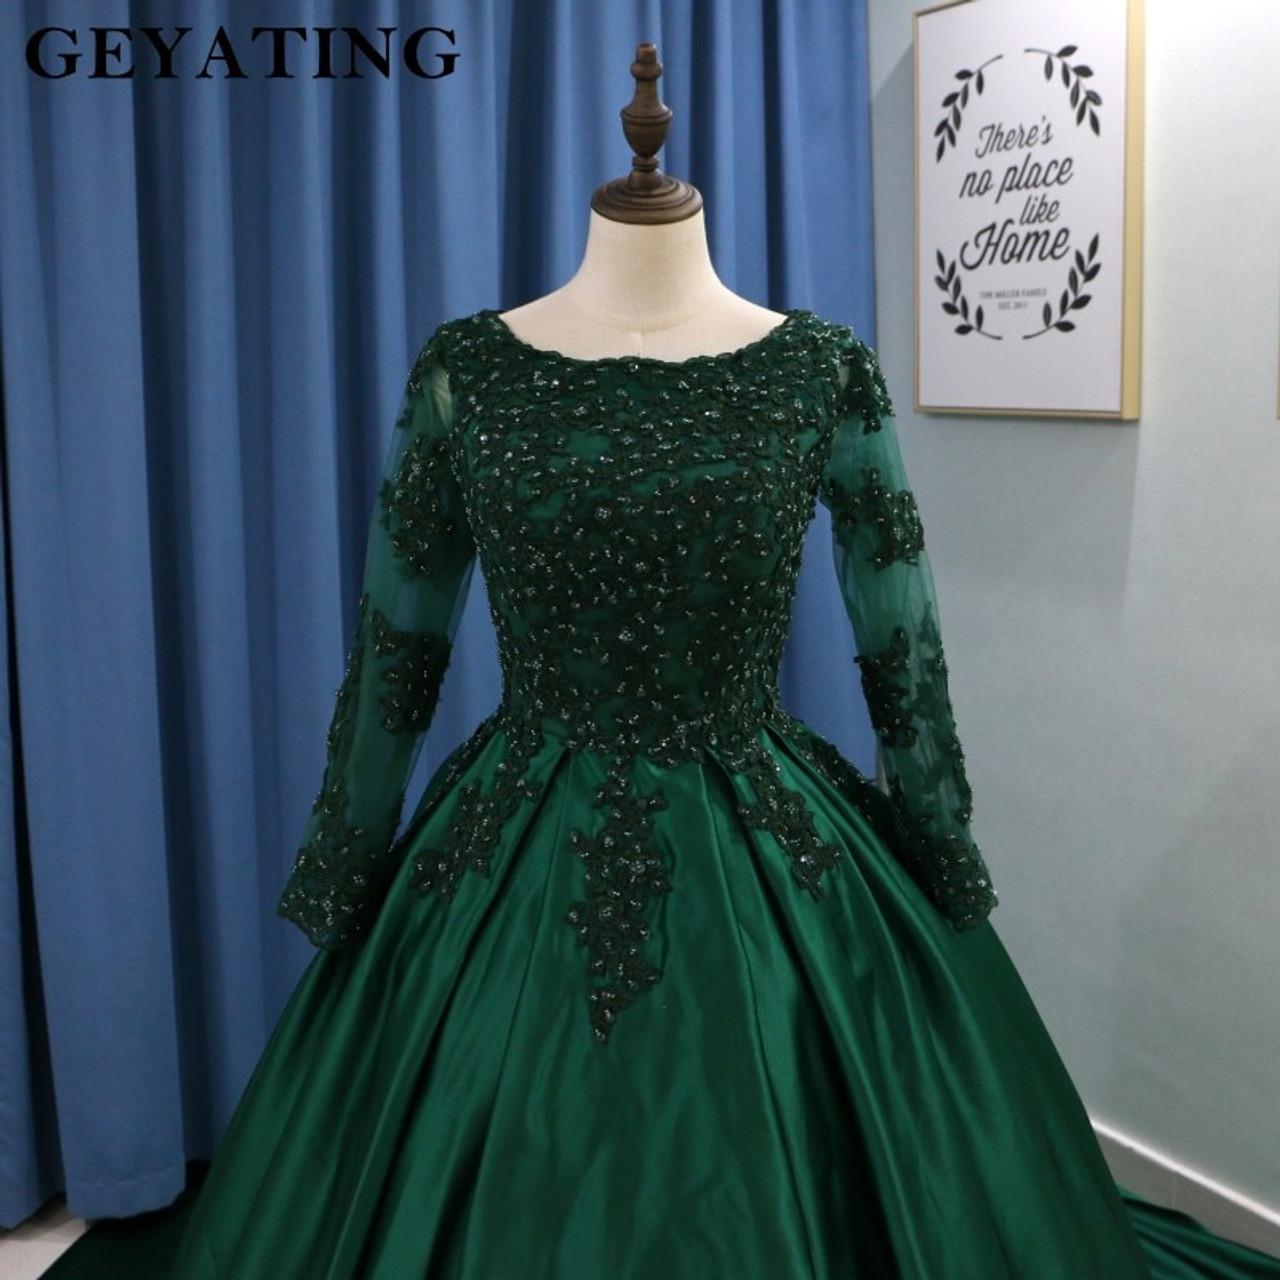 018d2d49e3a ... Emerald Green Lace Long Sleeves Muslim Wedding Dress 2018 Ball Gown  Princess Bride Dresses Islamic Satin ...